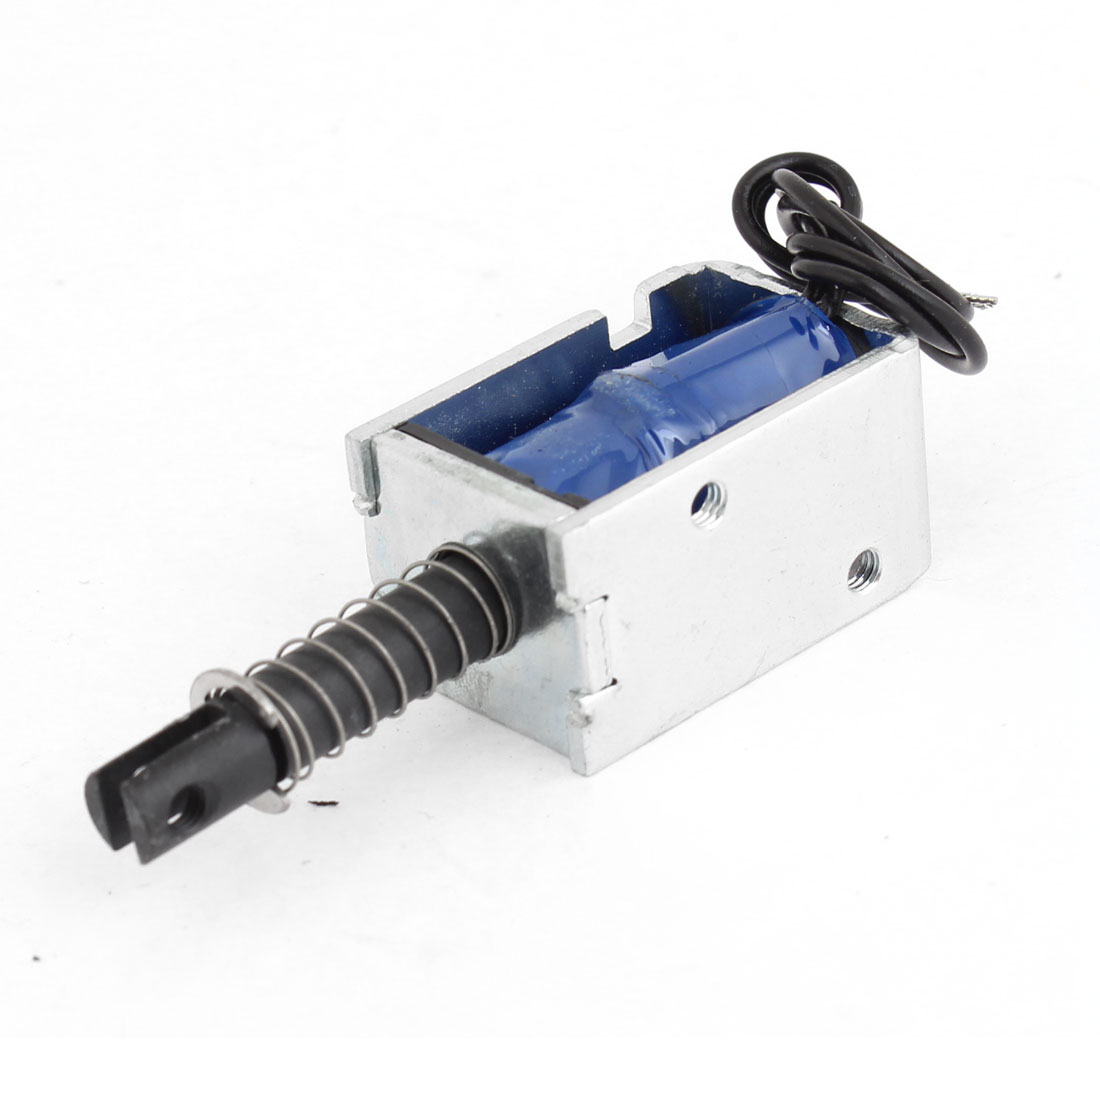 12VDC 300mA Open Frame Solenoid Electromagnet w Spring Plunger JF-0730B